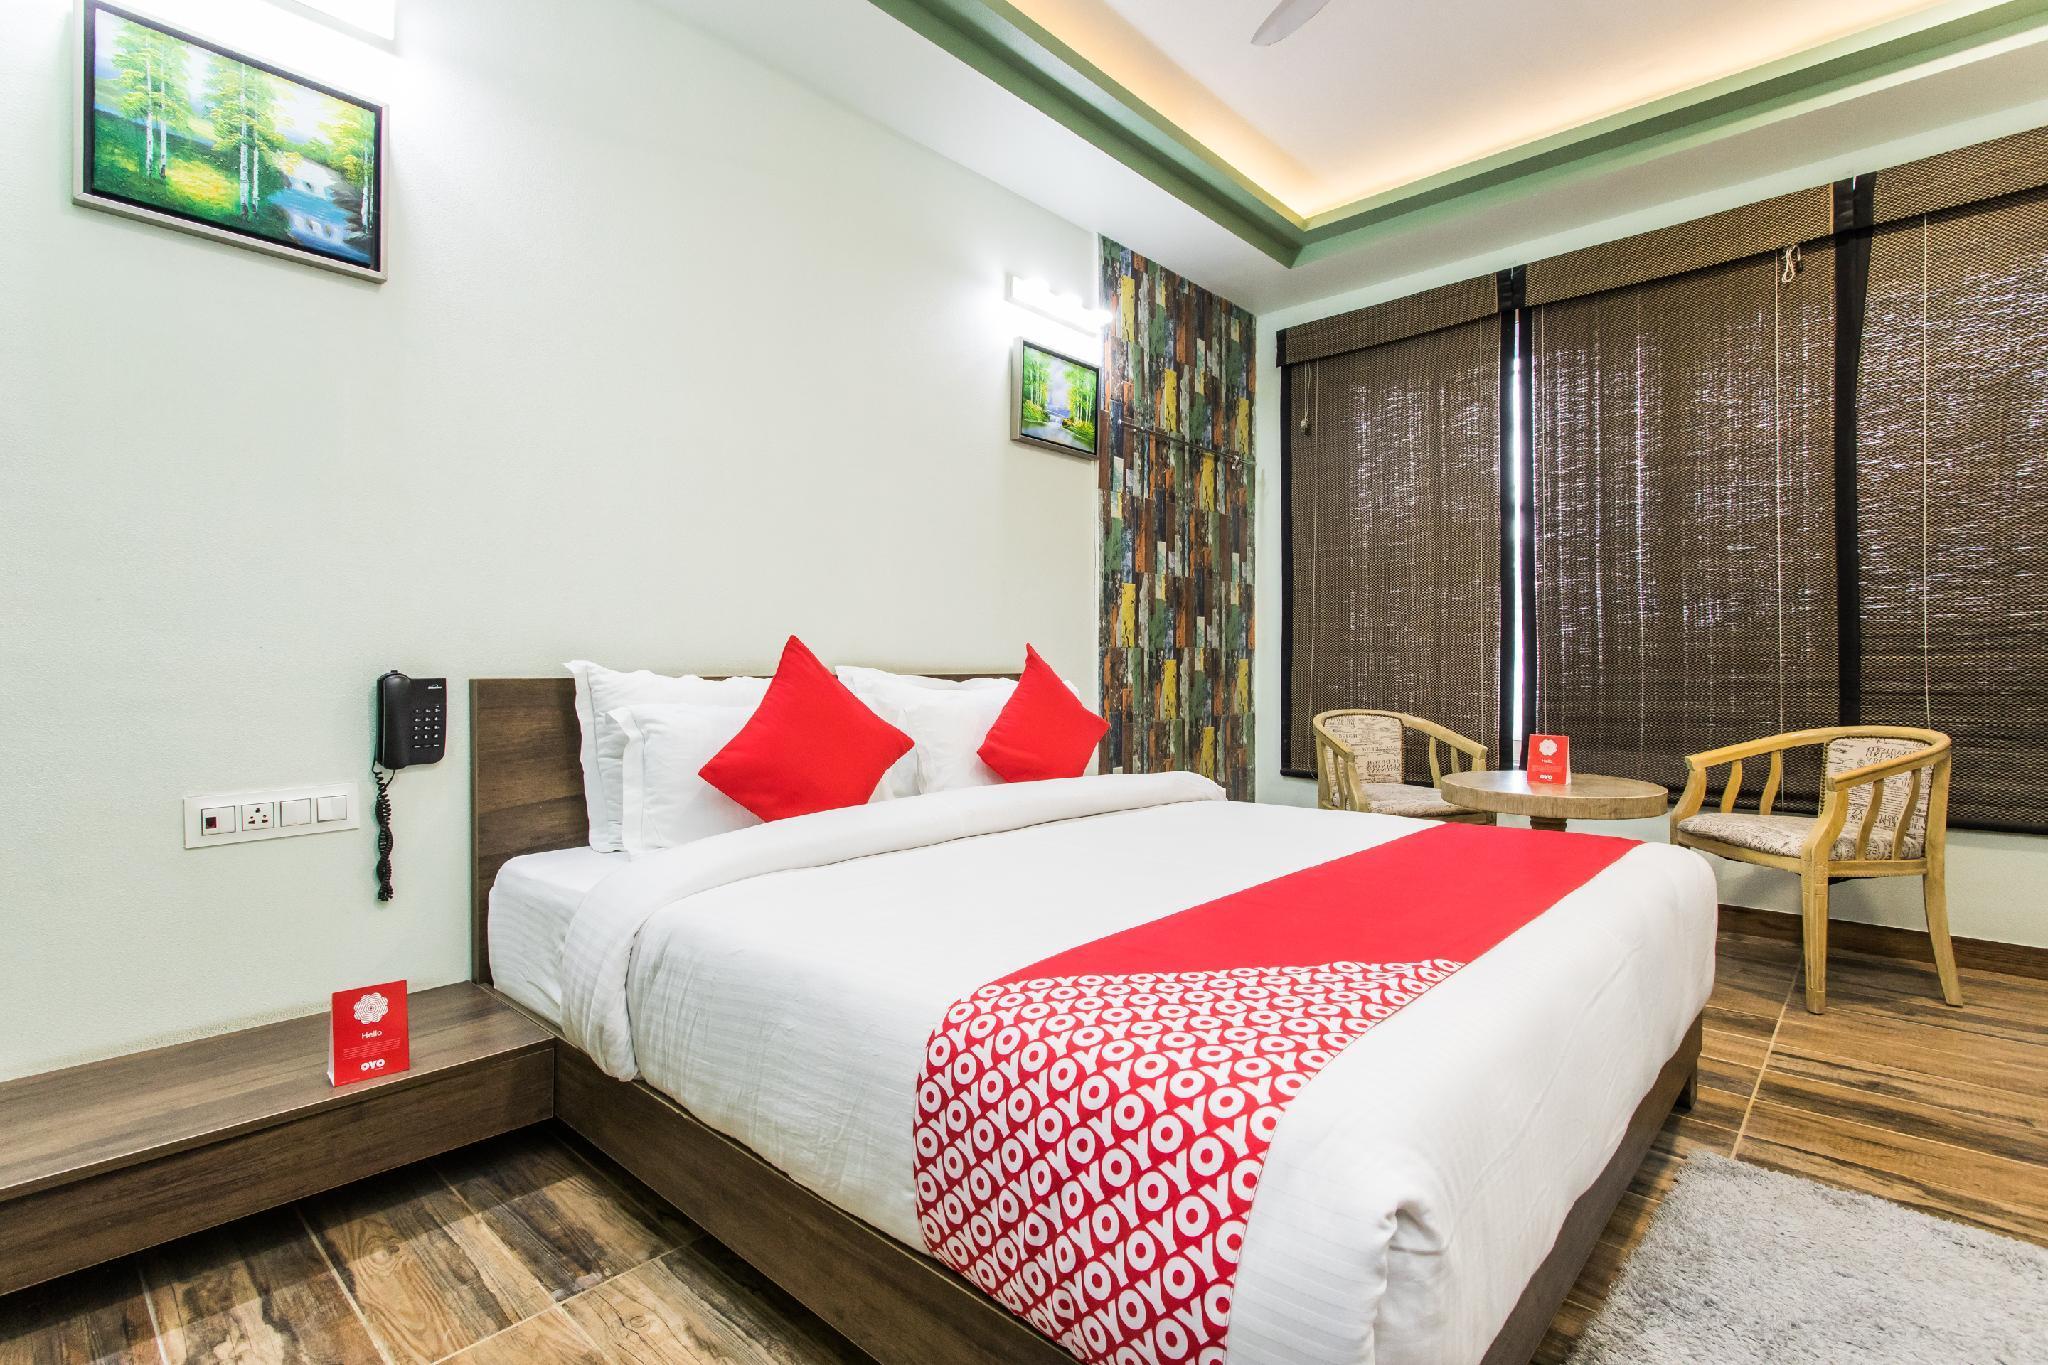 Capital O 15445 Hotel Sheekhar Inn